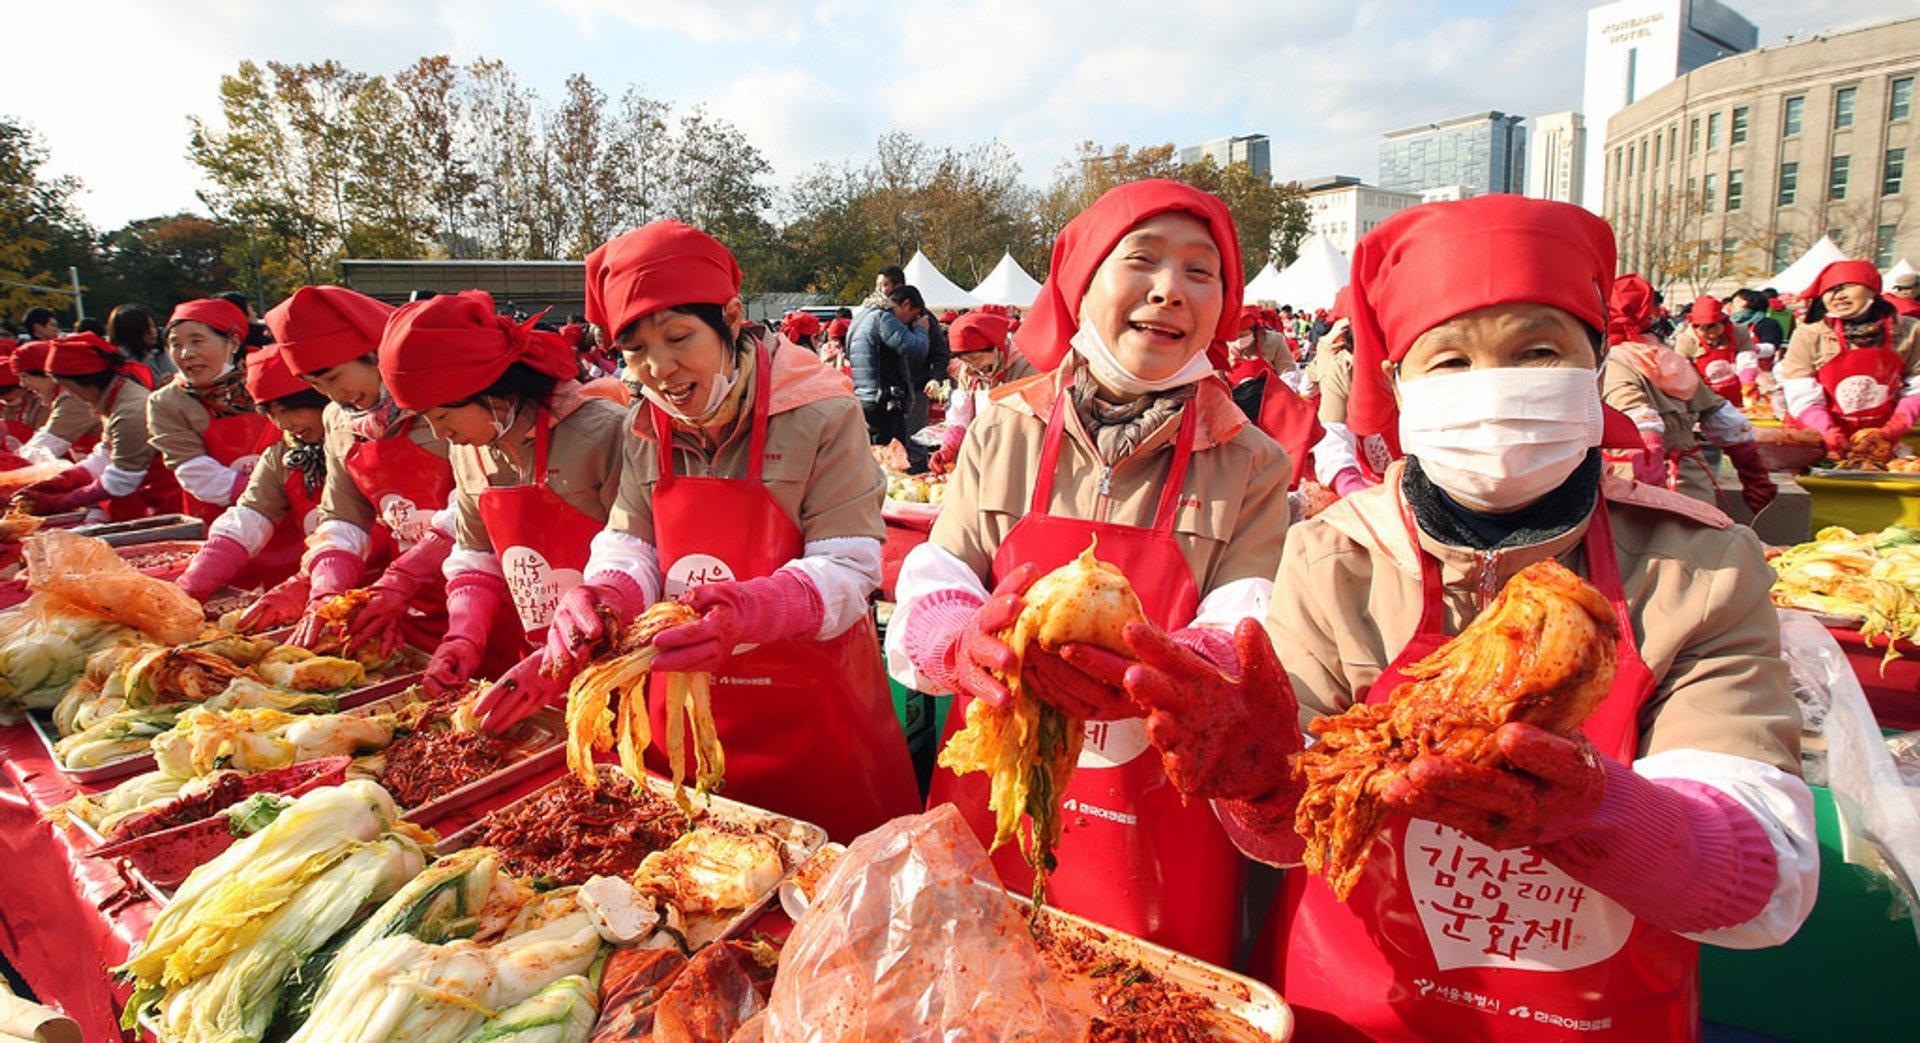 Kimchi Festival in Seoul 2019 - Best Time